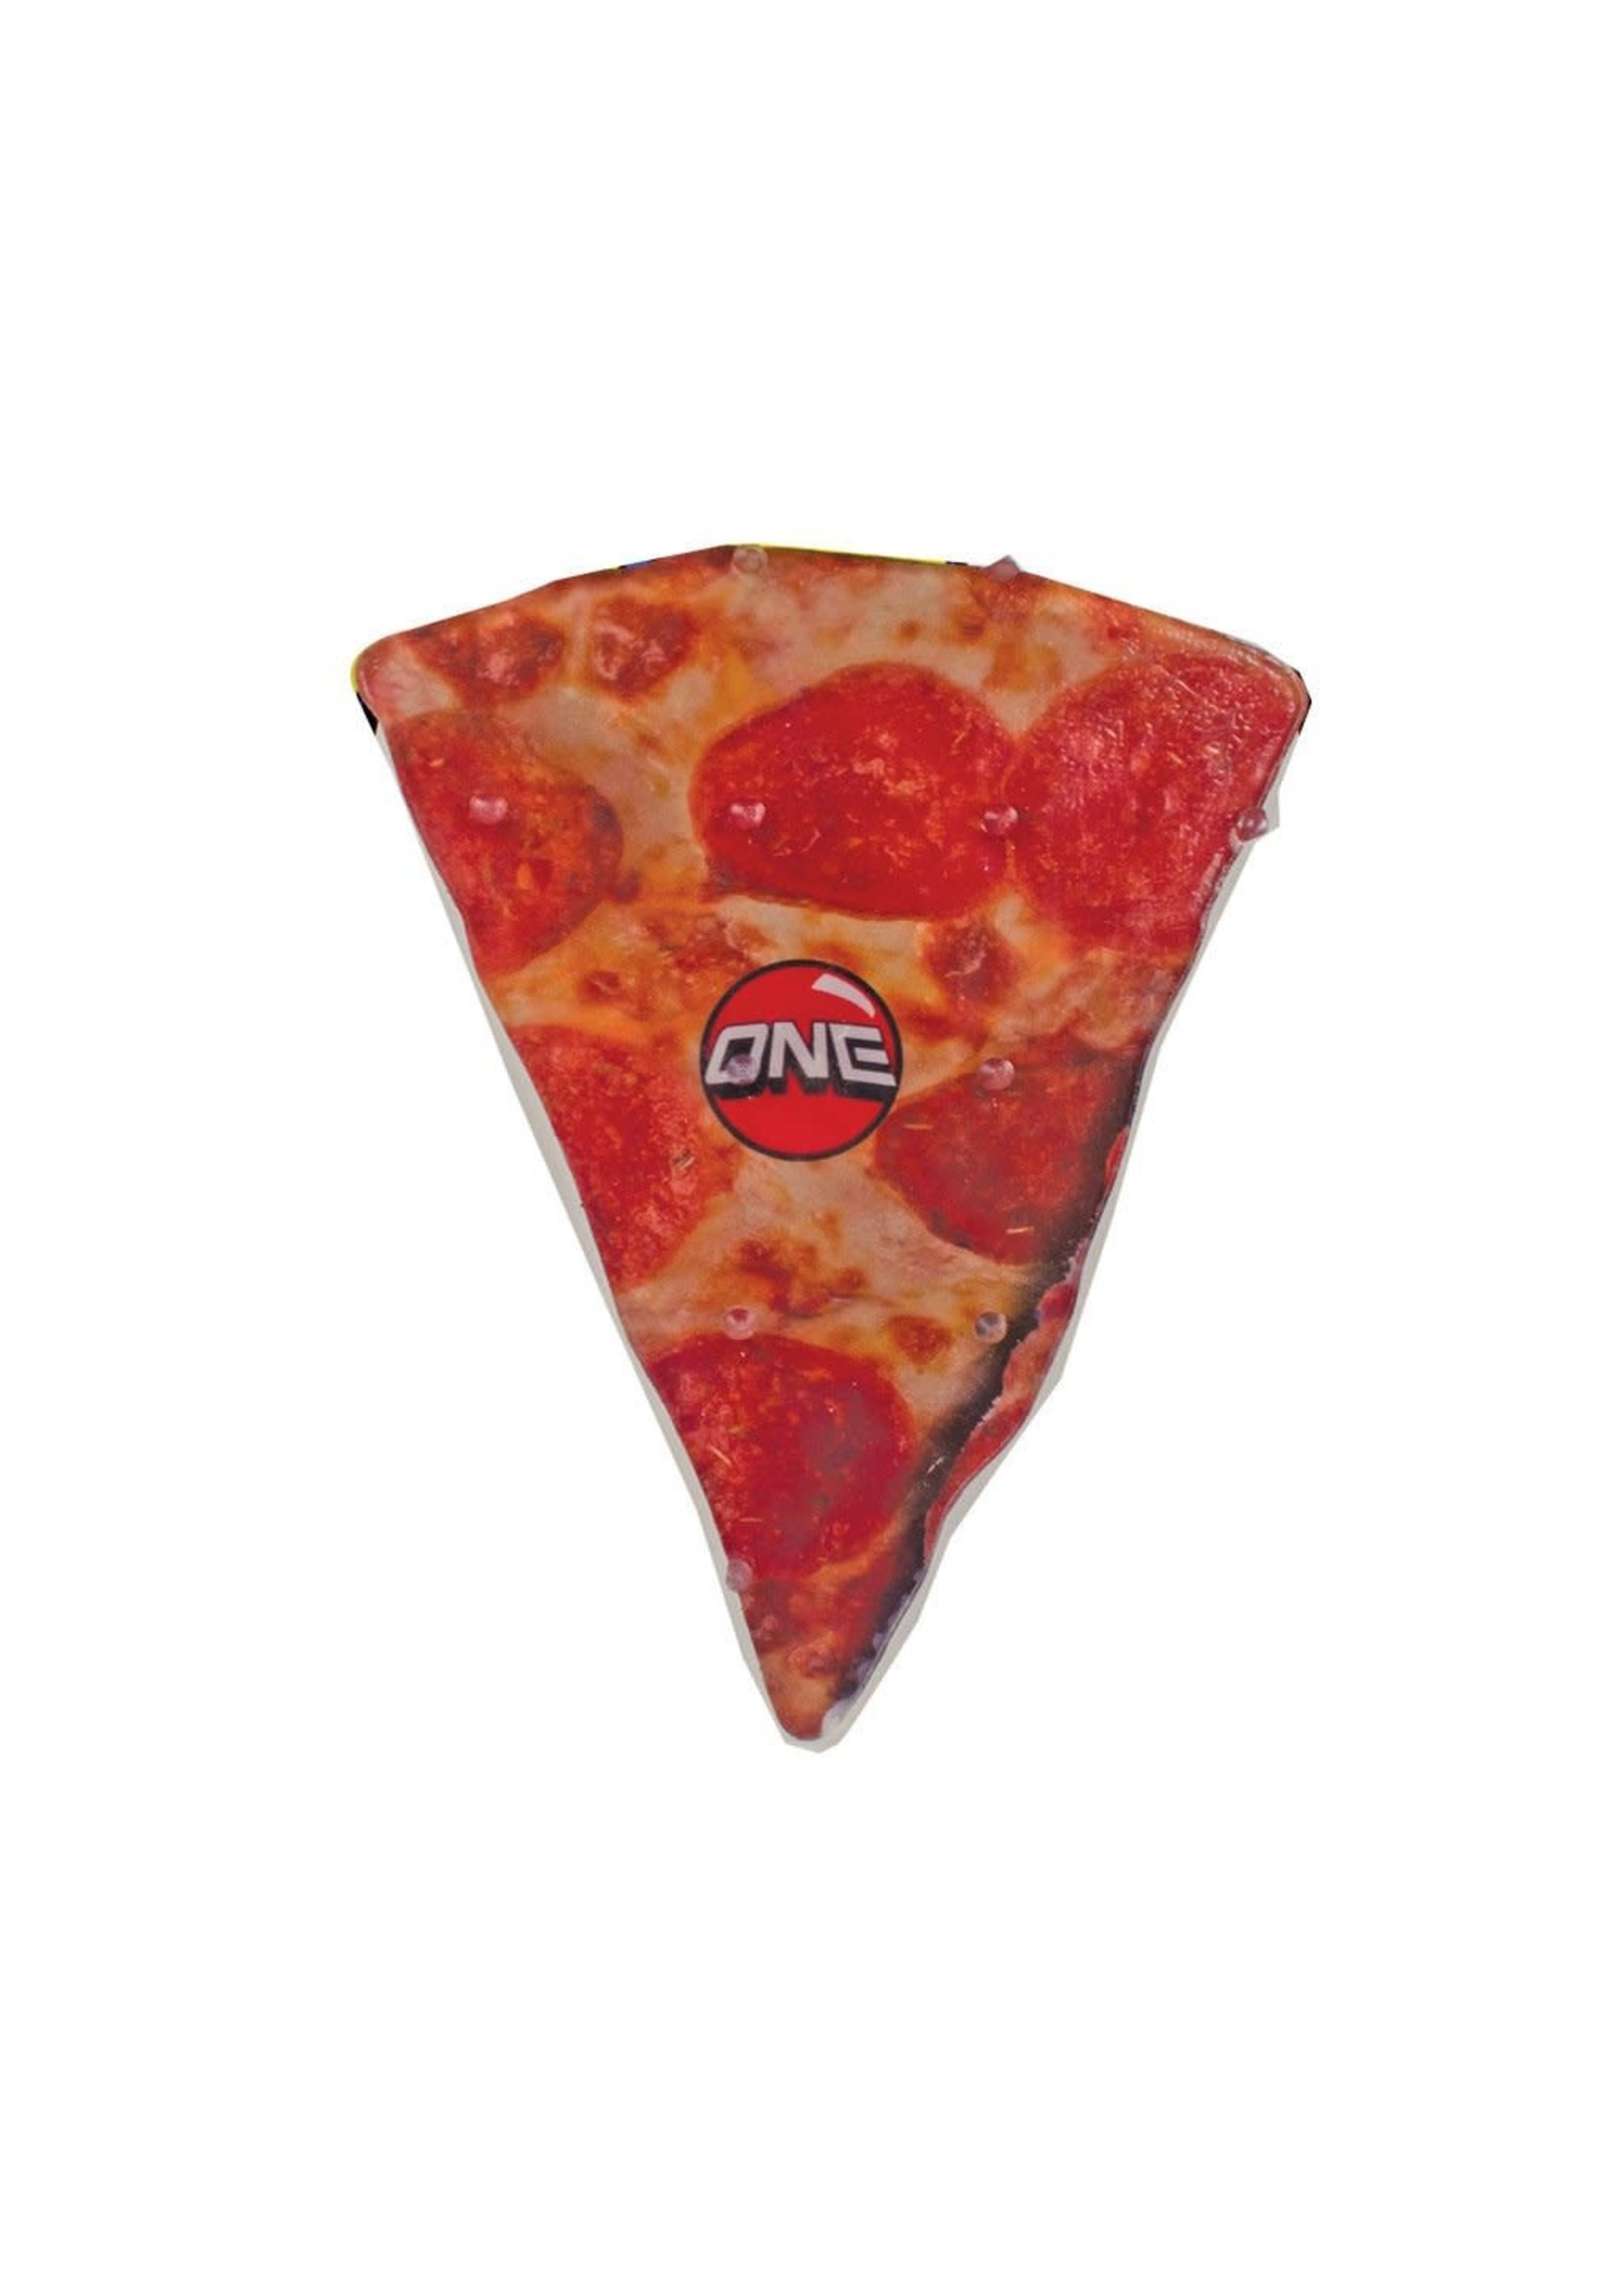 Oneball Mfg. Food Traction Pad